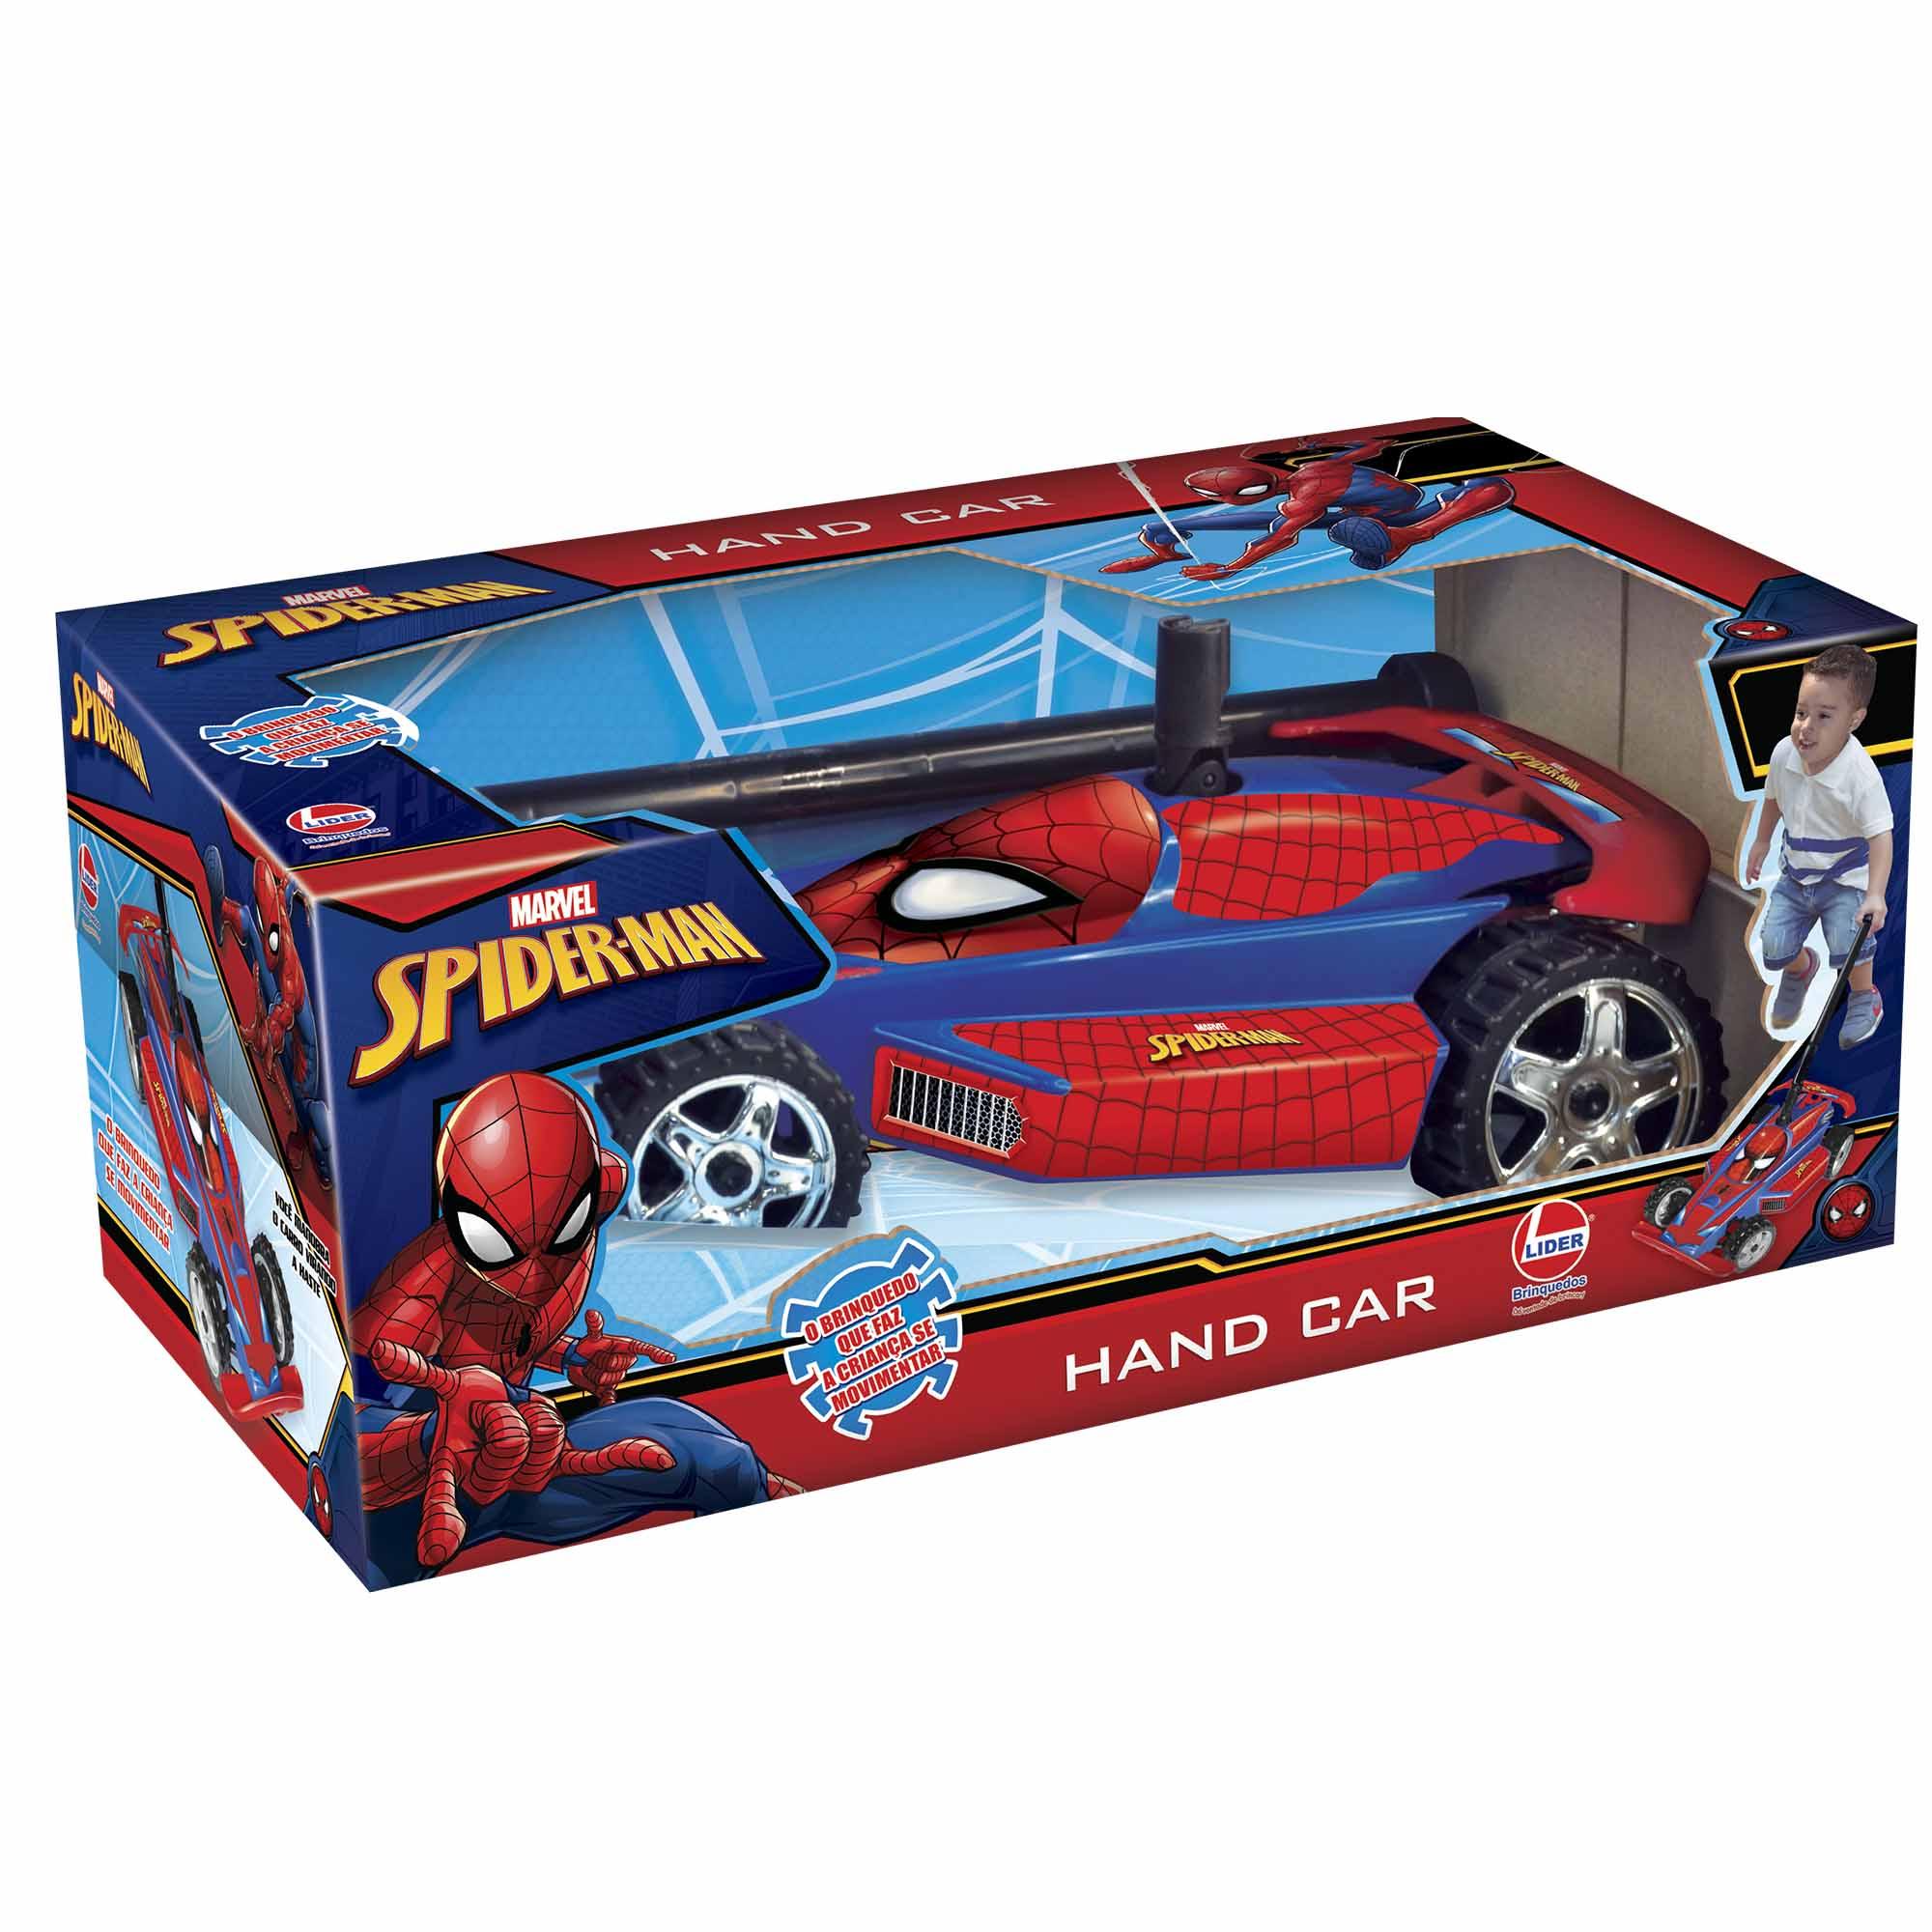 HAND CAR AVENGERS SPIDERMAN